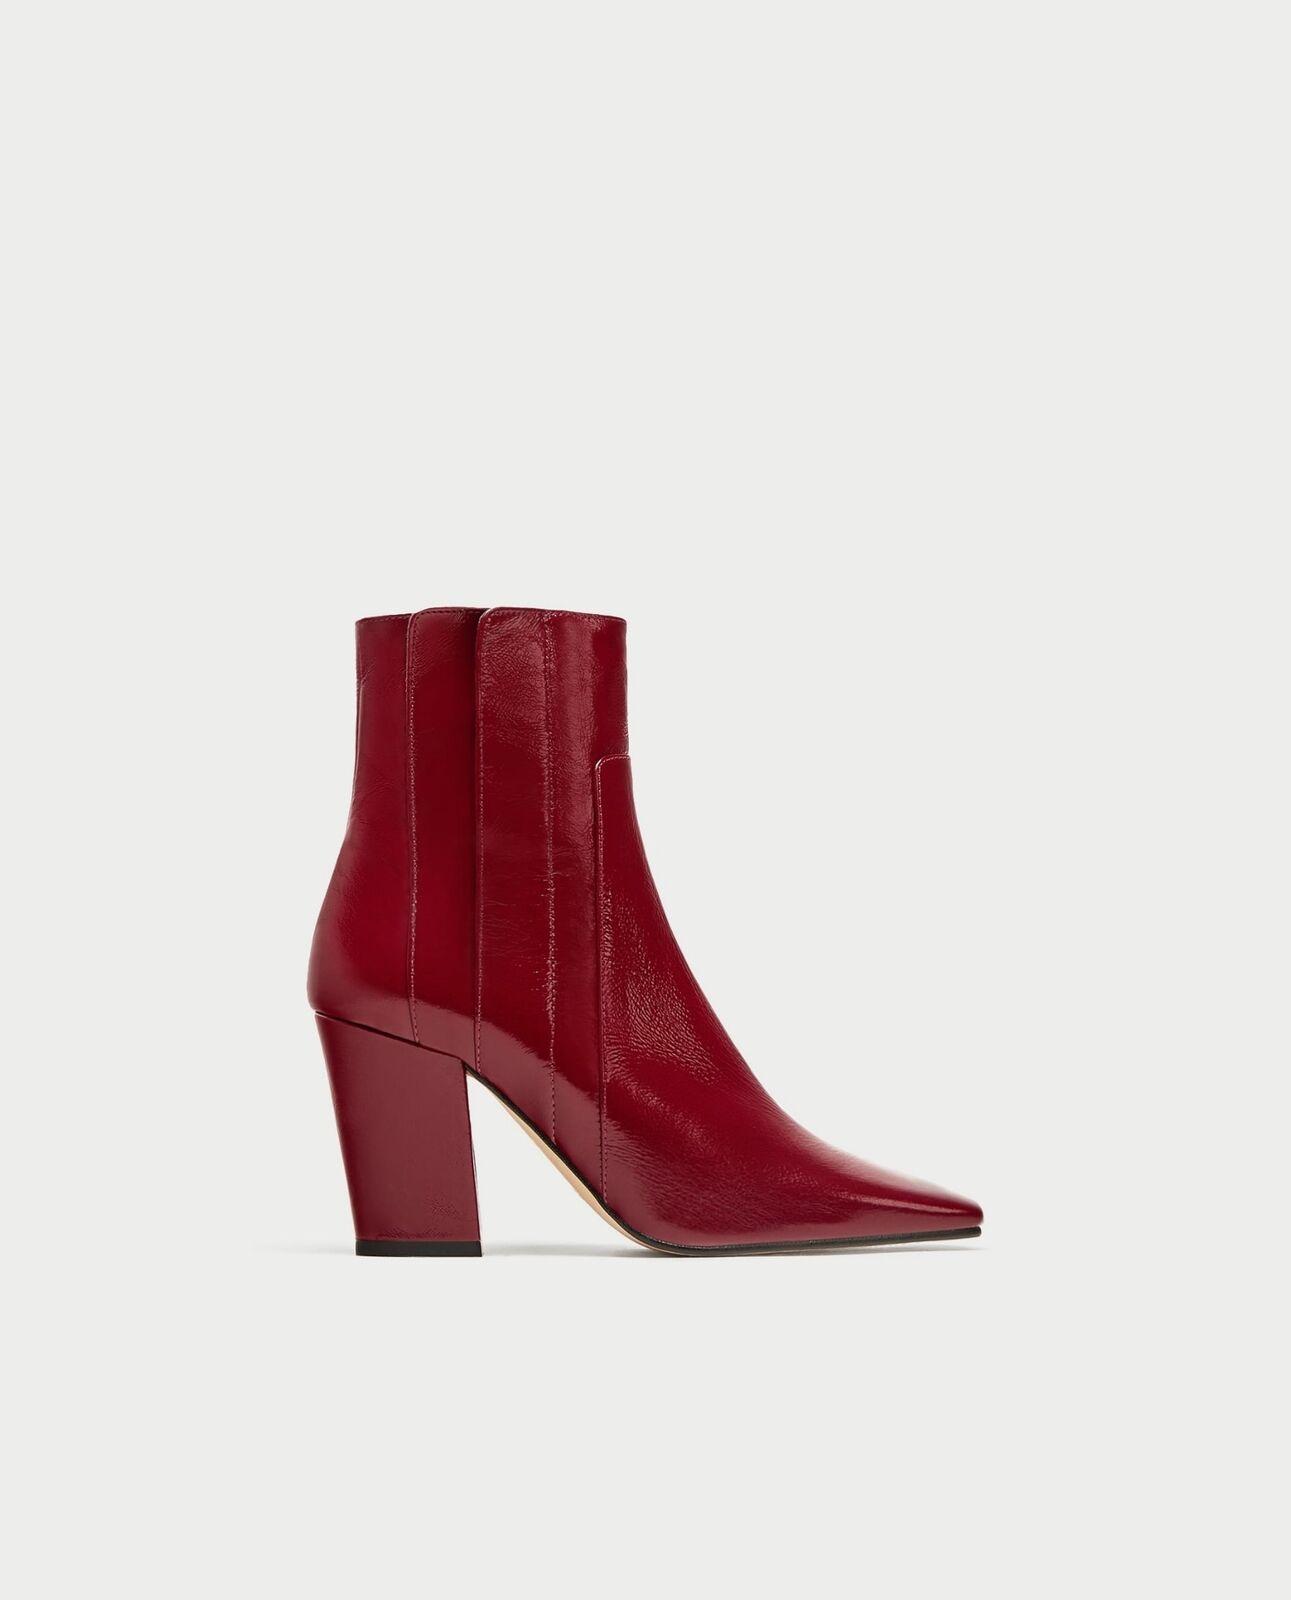 BNWT ZARA Leather High Heel Ankle  stivali..40 UK 7 US 9 REF.6900  201  disponibile